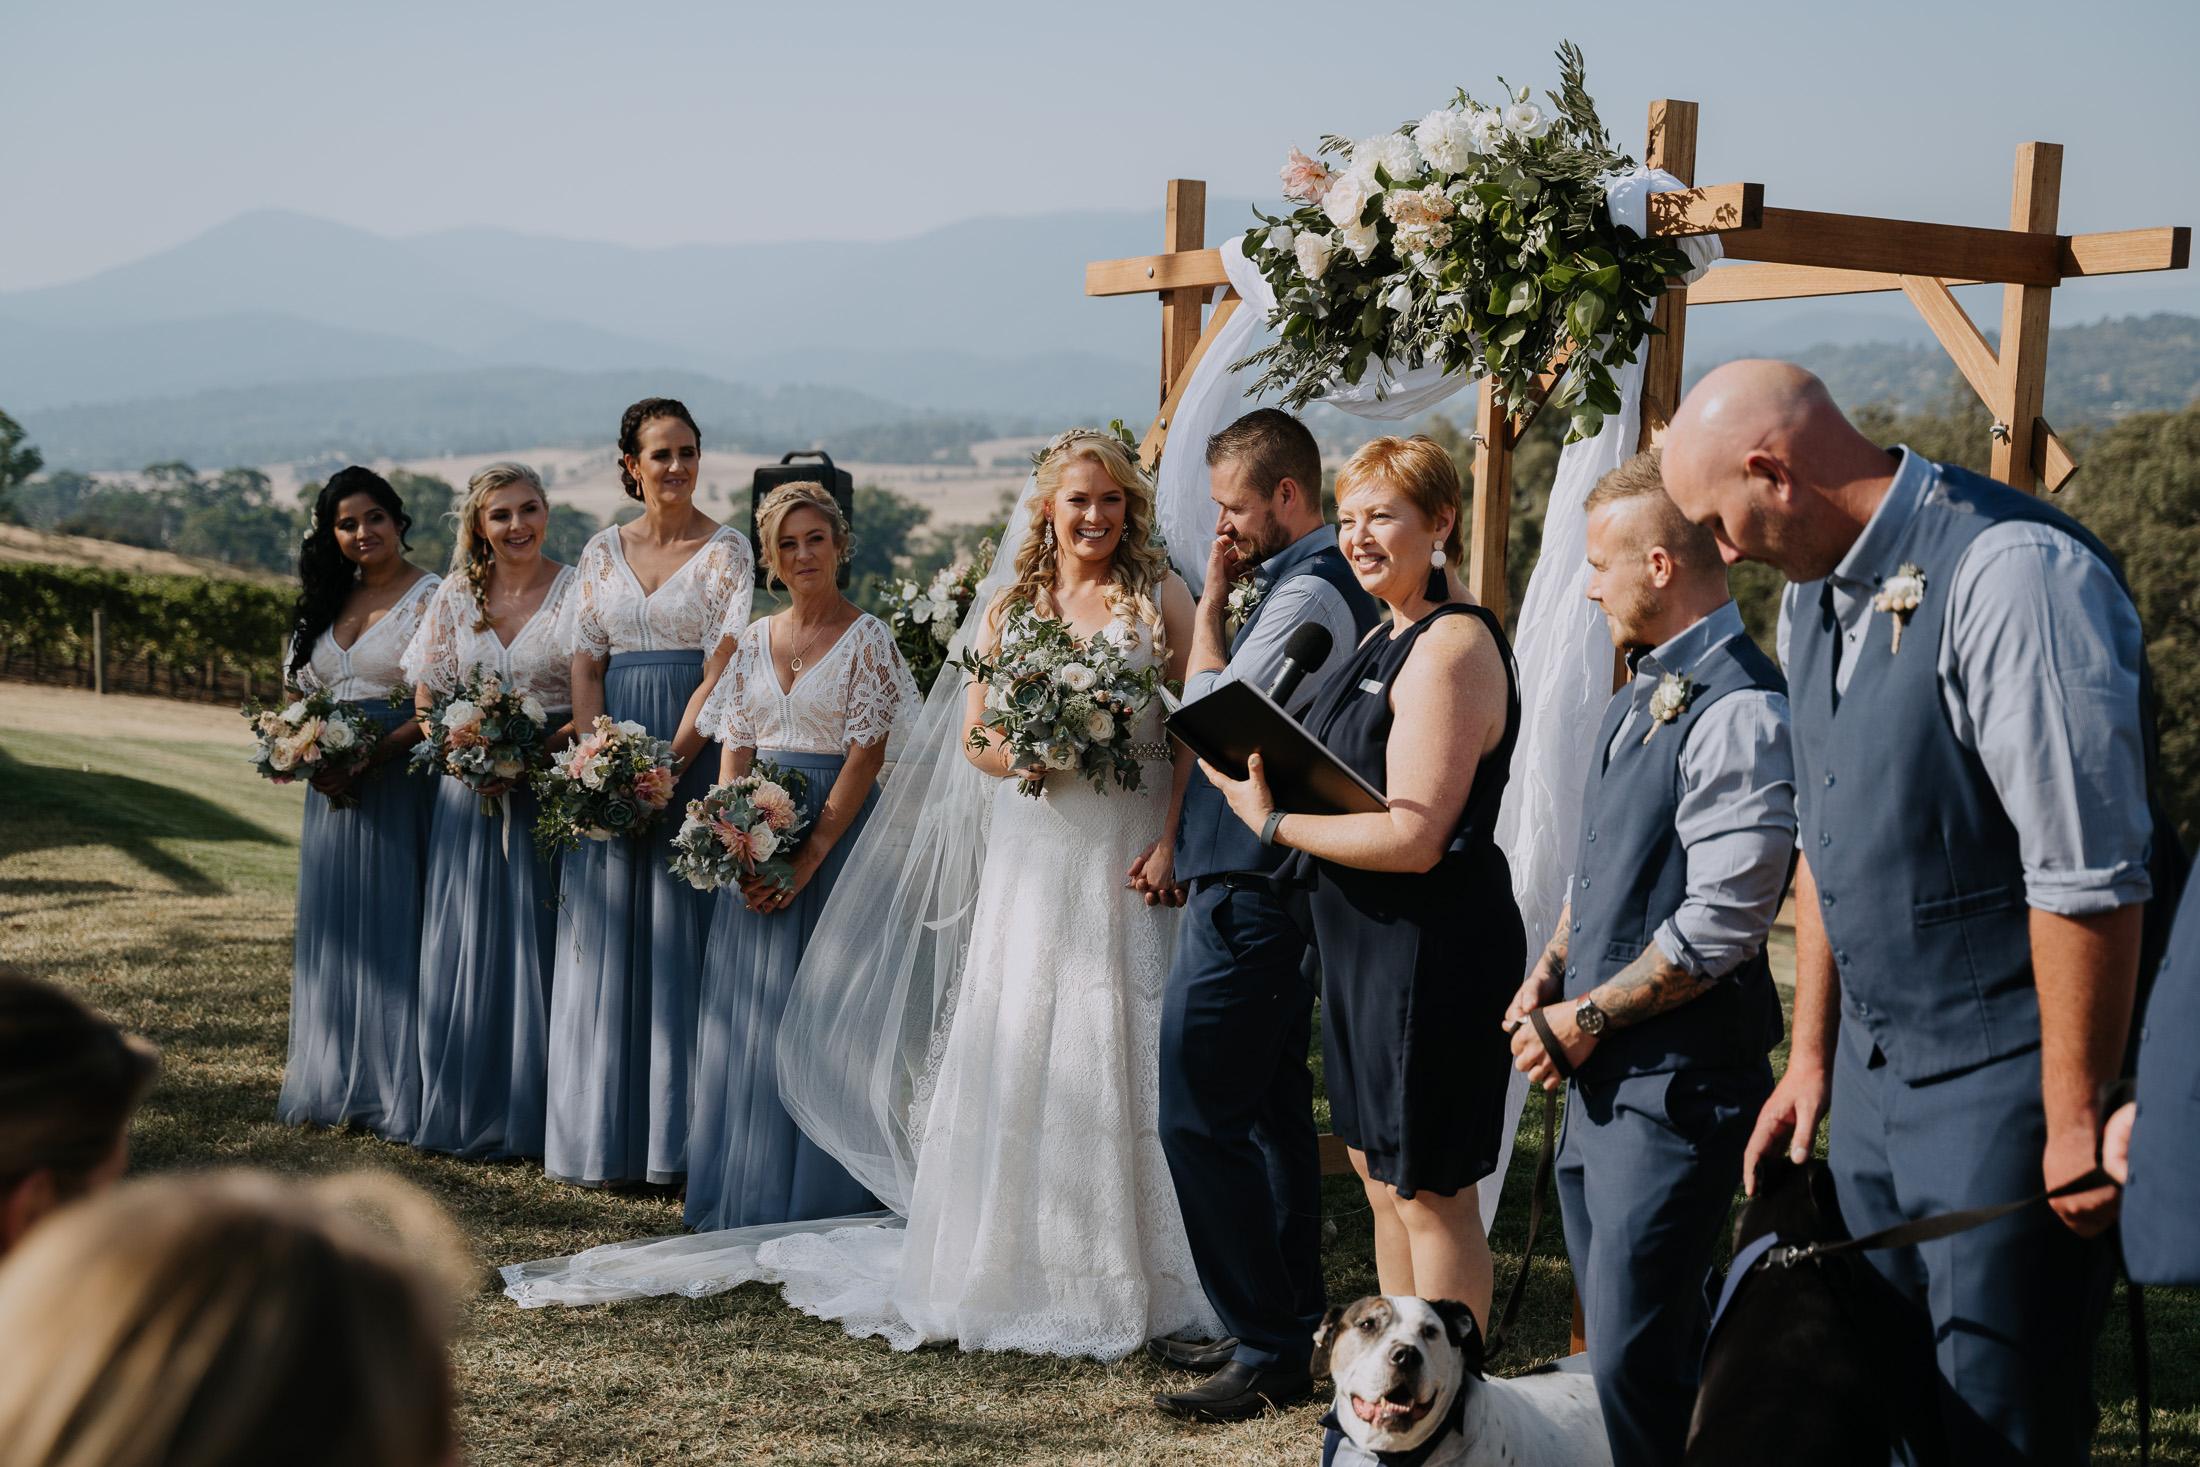 Penny-and-Neil-Riverstone-Estate-Wedding-Rick Liston.jpeg